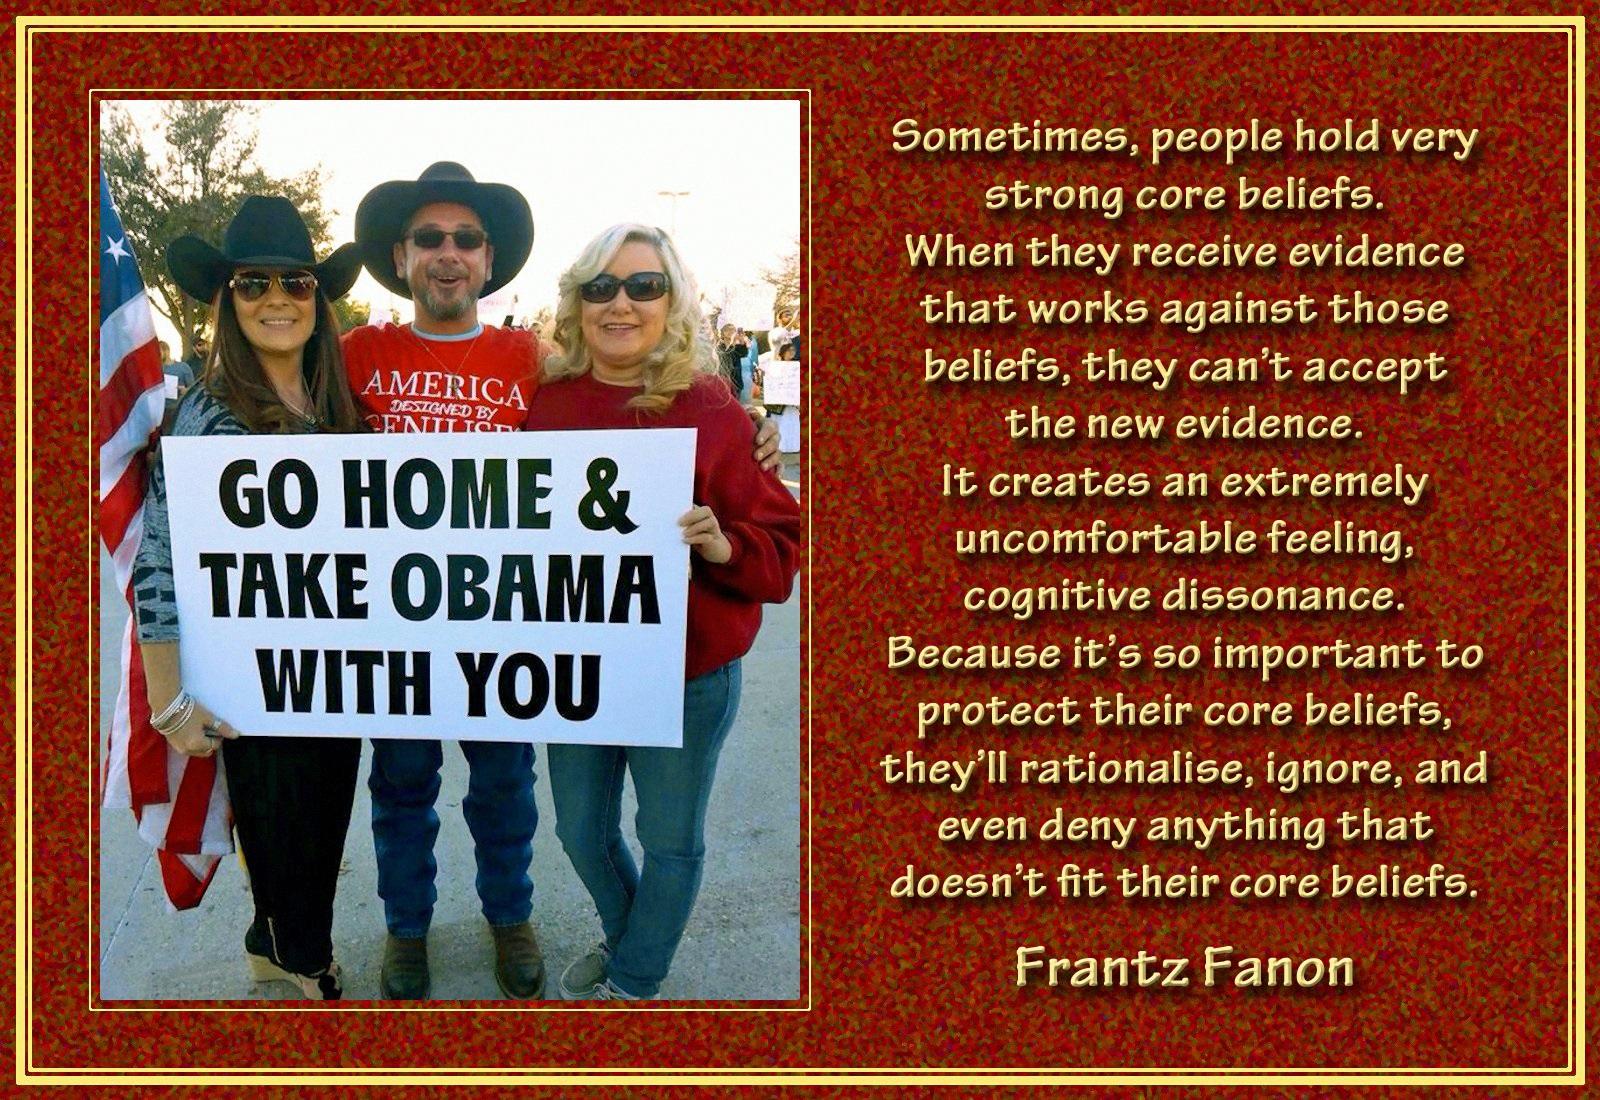 00 frantz fanon hate speech 151115